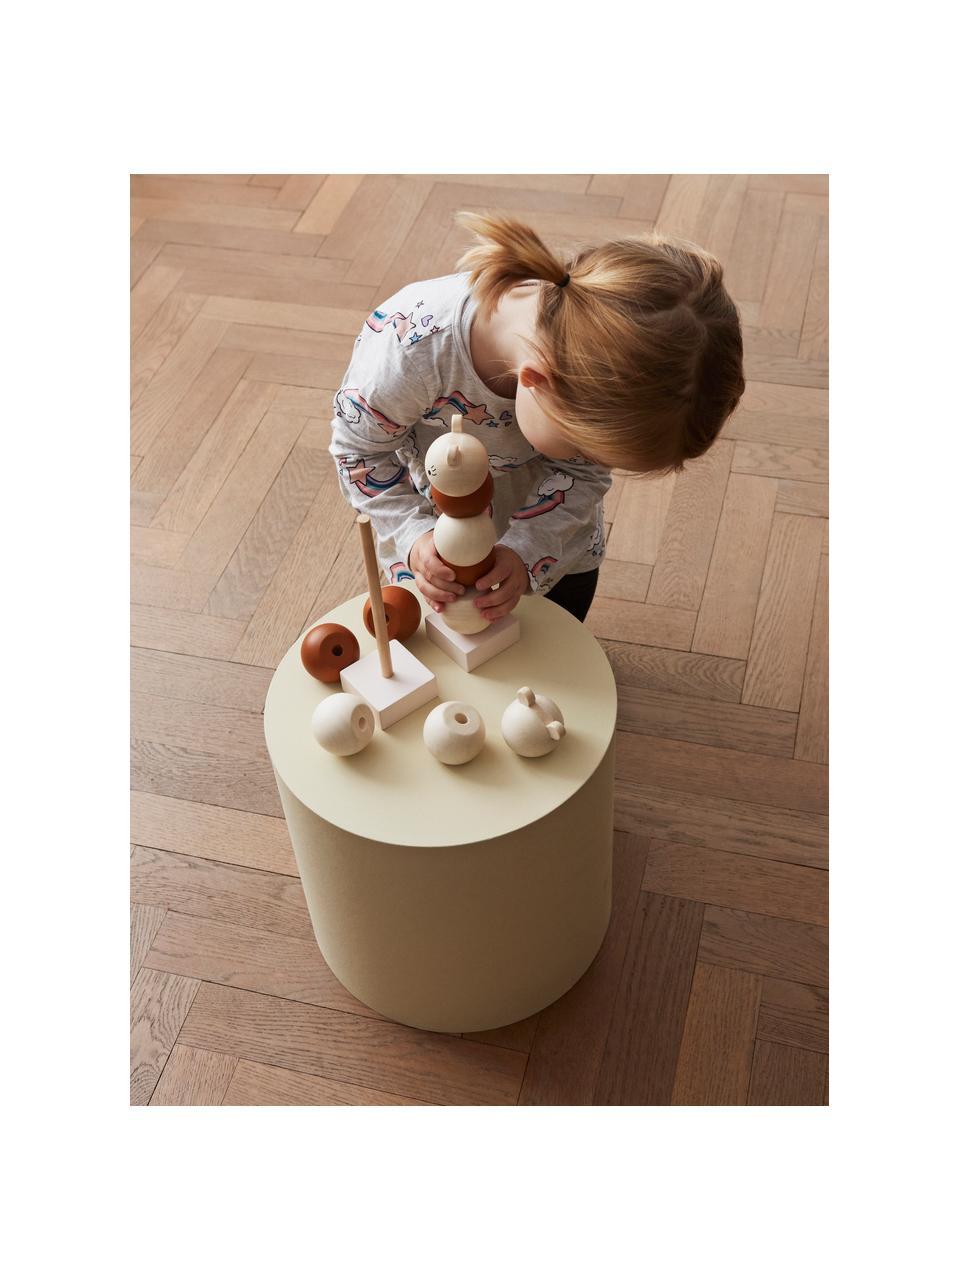 Großes Stapelspielzeug Lala aus Buchenholz, Buchenholz, beschichtet, Braun, Creme, Ø 6 x H 23 cm